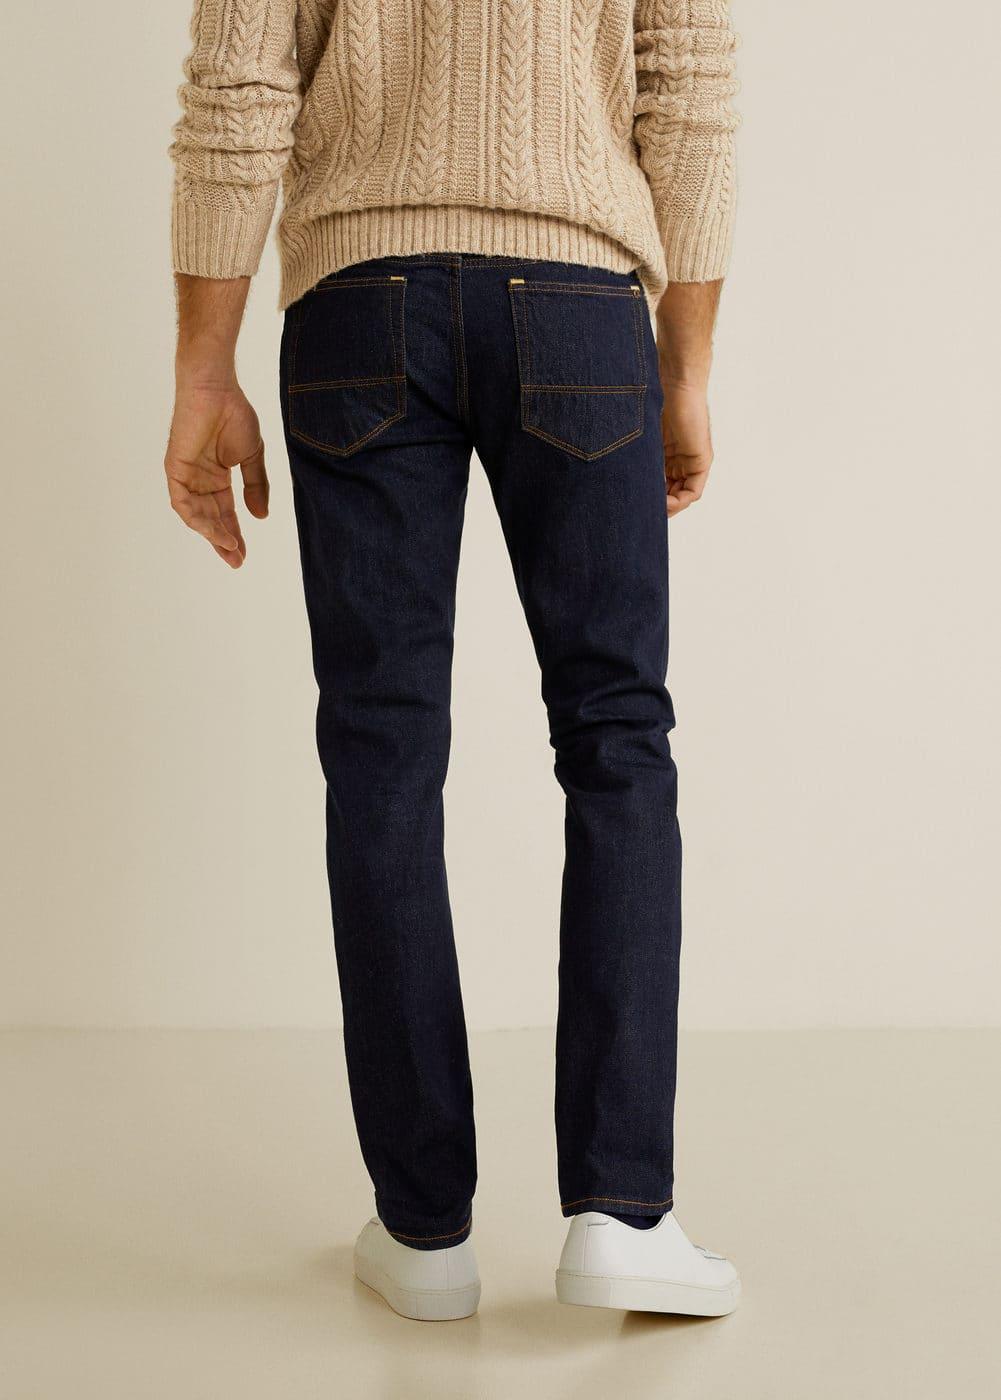 Mango - Jeans Tim slim-fit lavado oscuro - 3